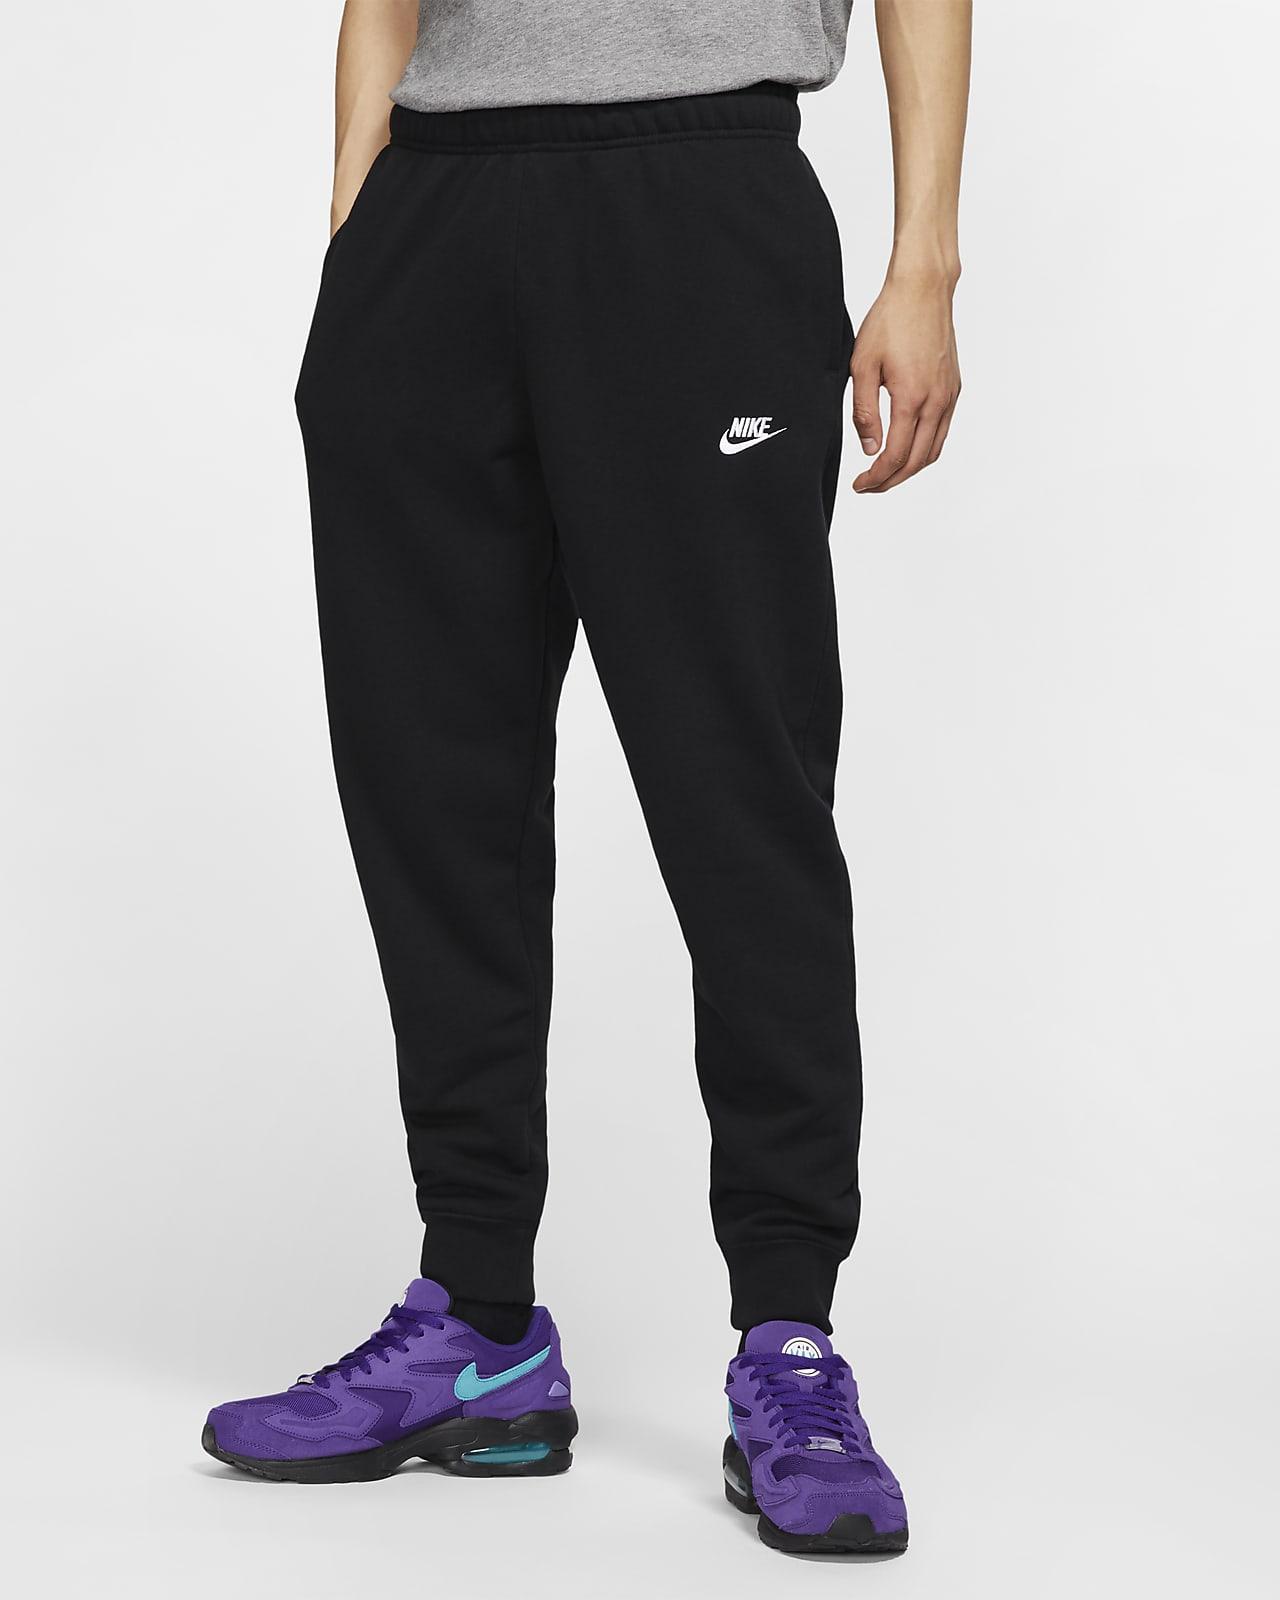 Pantalon nike homme: la sélection jogging running homme nike